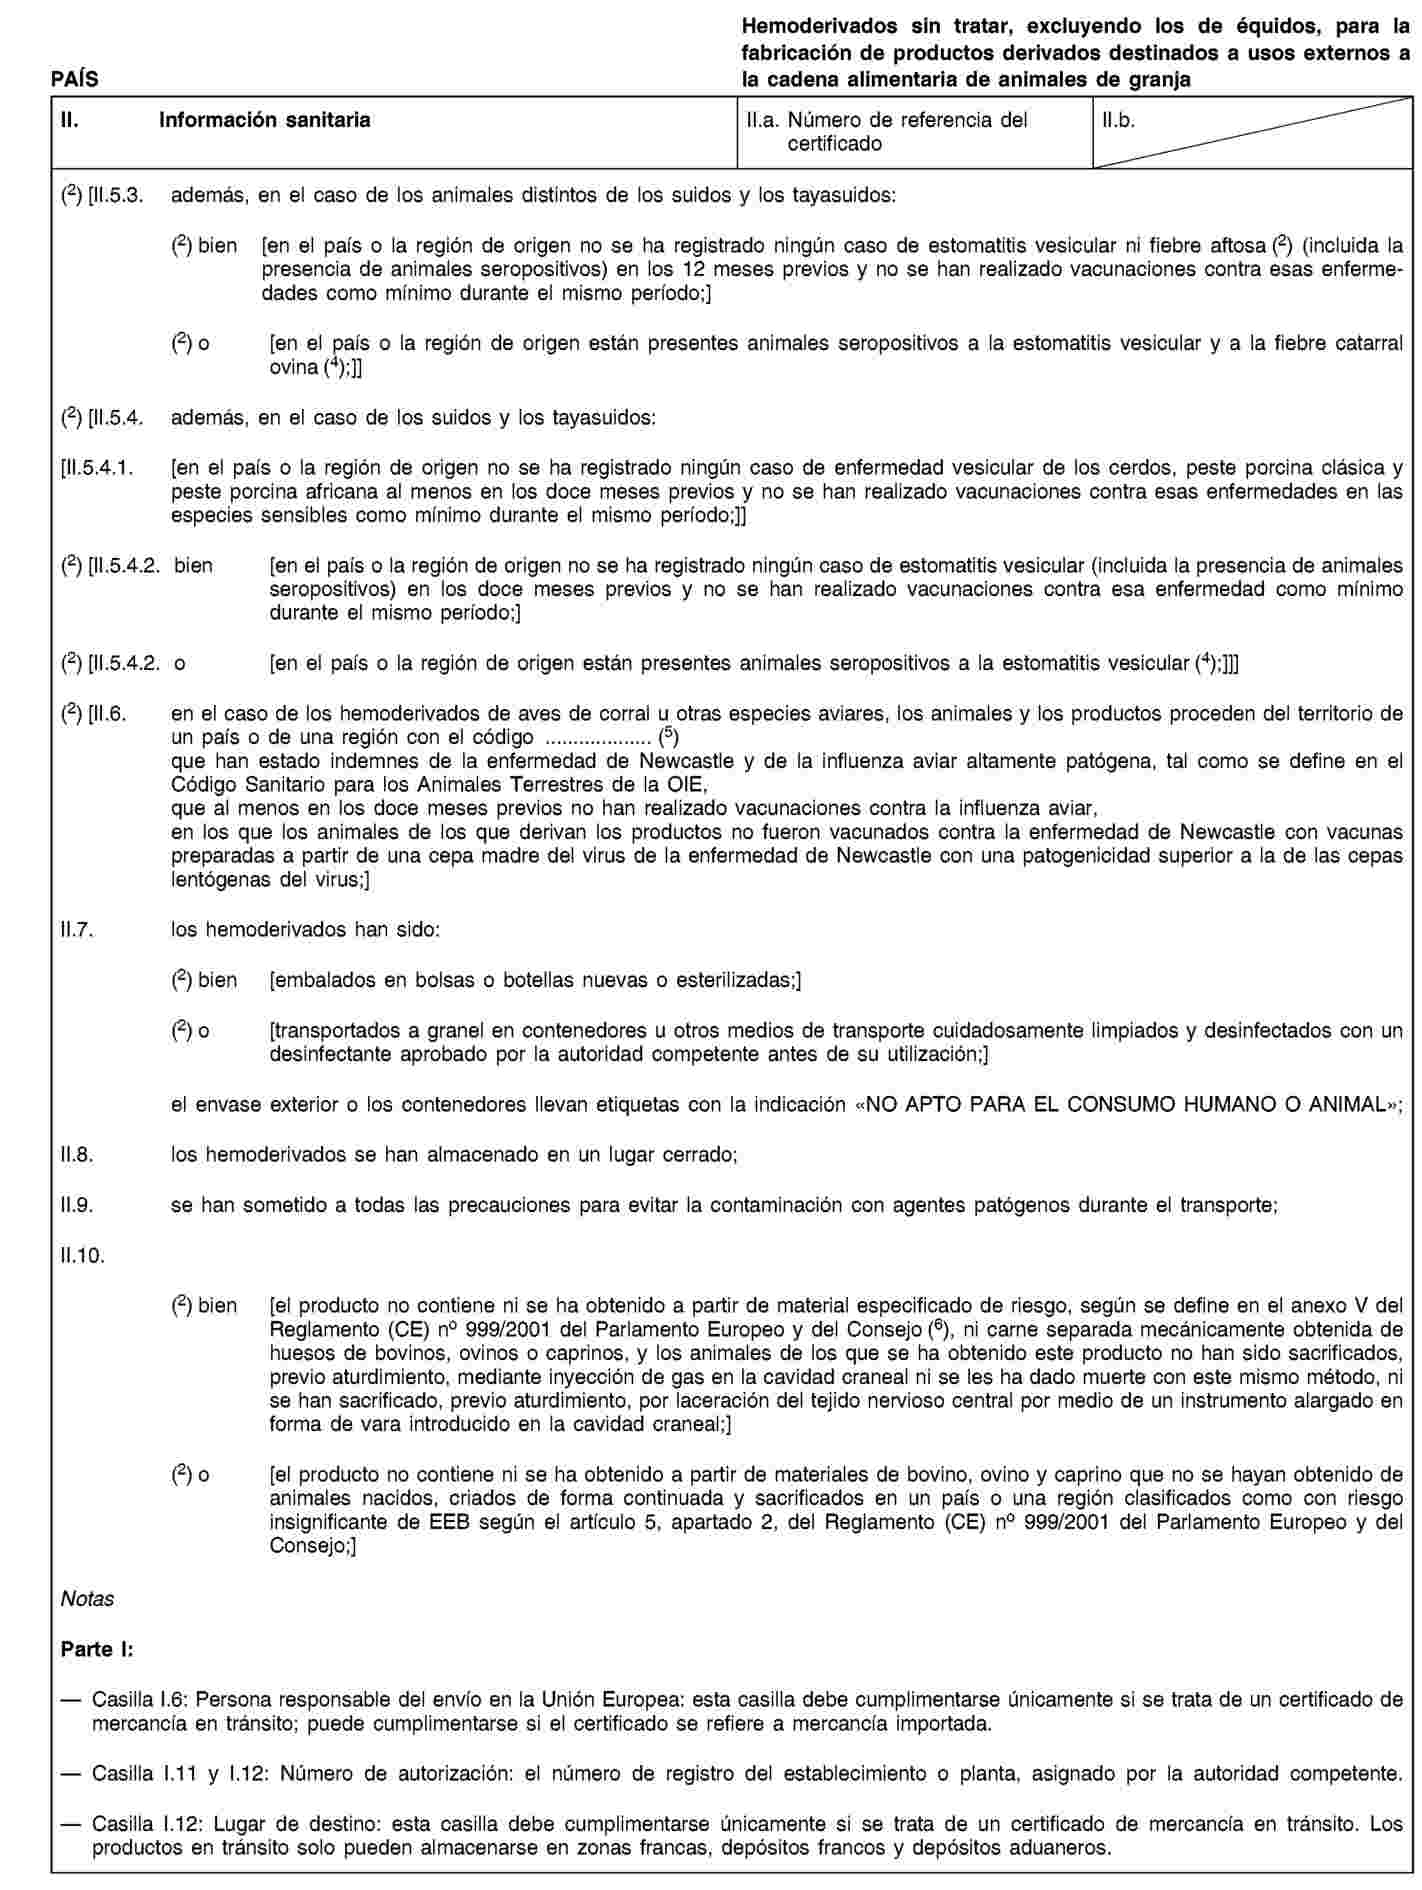 Imagen: https://eur-lex.europa.eu/resource.html?uri=uriserv:OJ.L_.2011.054.01.0001.01.SPA.xhtml.L_2011054ES.01017001.tif.jpg